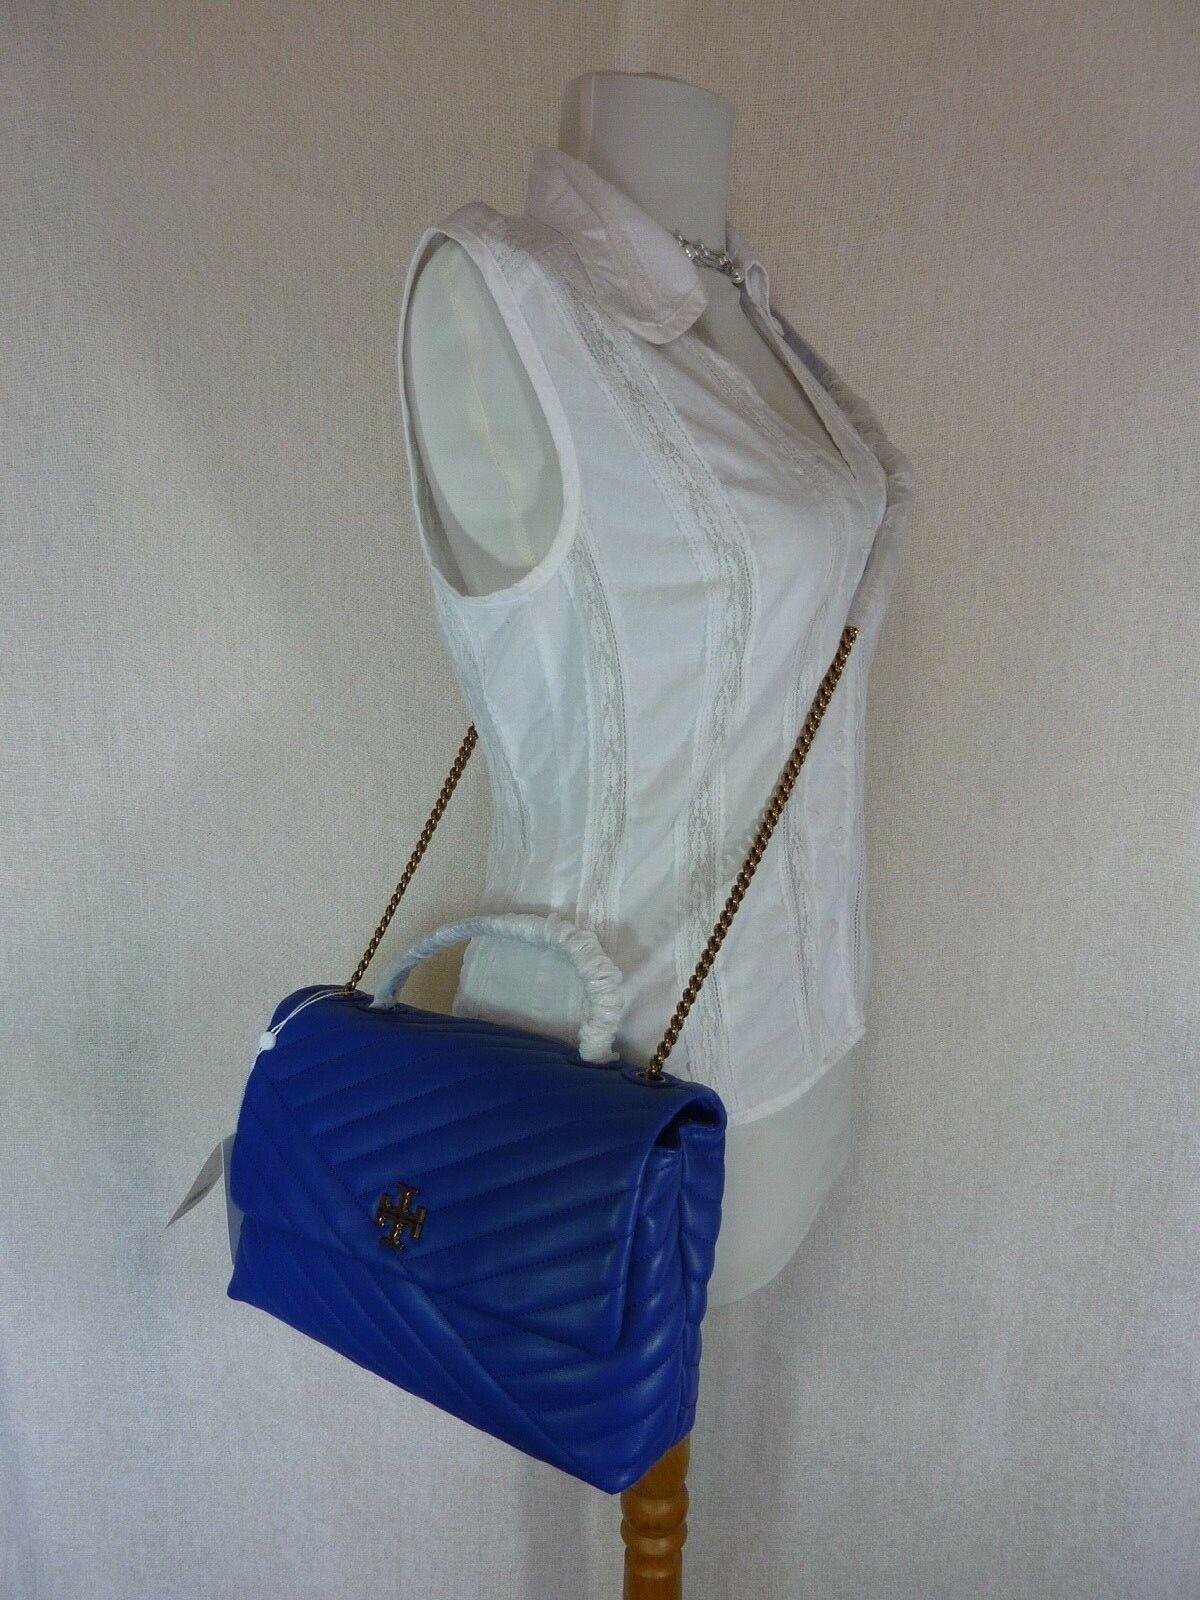 NWT Tory Burch Nautical Blue Kira Chevron Convertible Shoulder Bag image 3